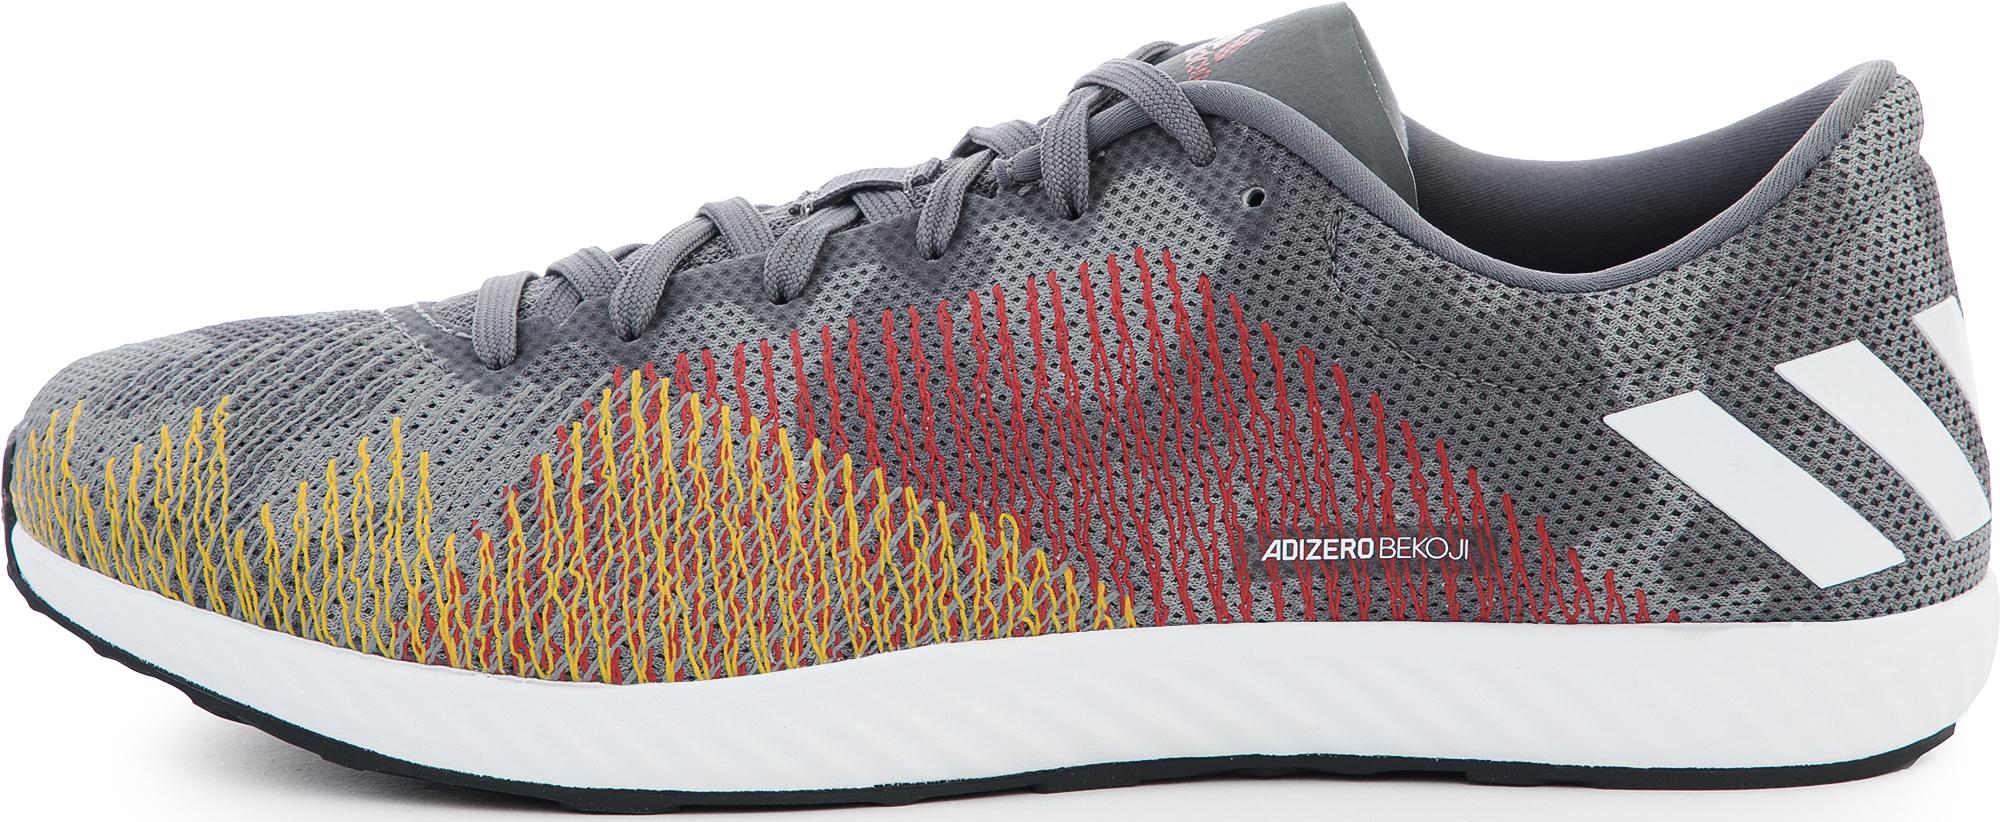 Adidas Кроссовки мужские Adizero Bekoji, размер 46